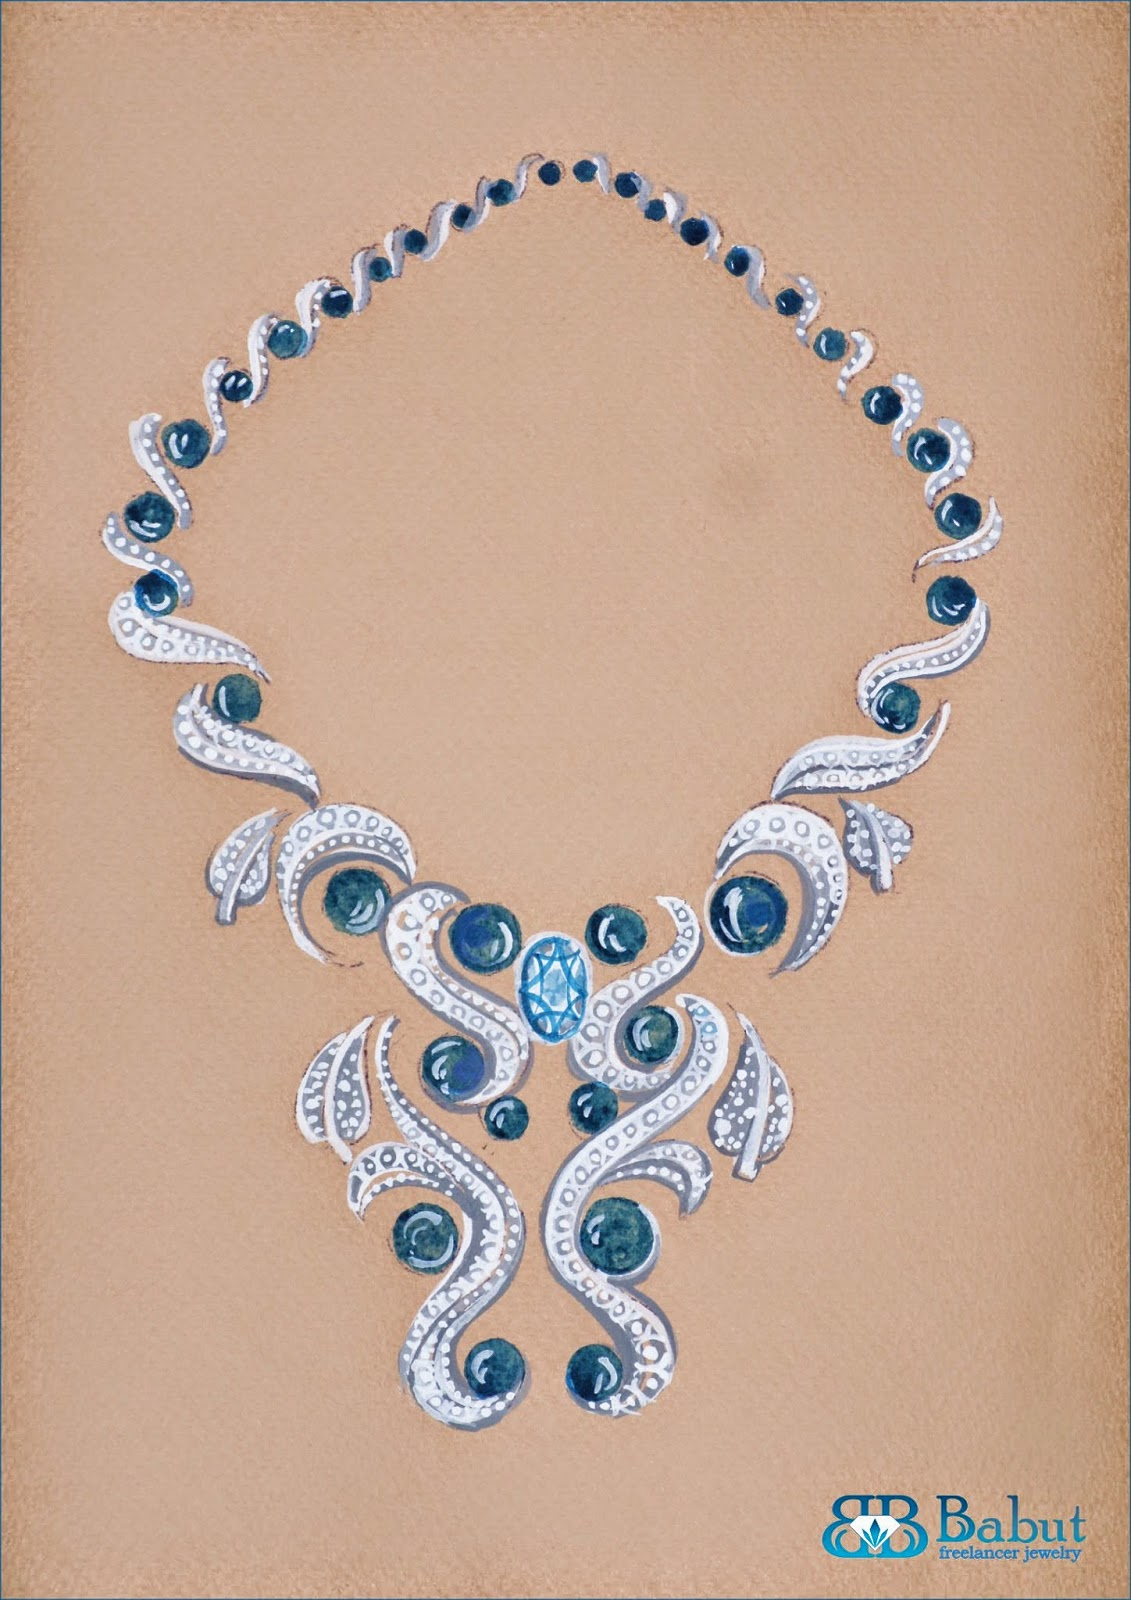 Sketch Jewelry - Babut Florin - Valentin: sketches design ...